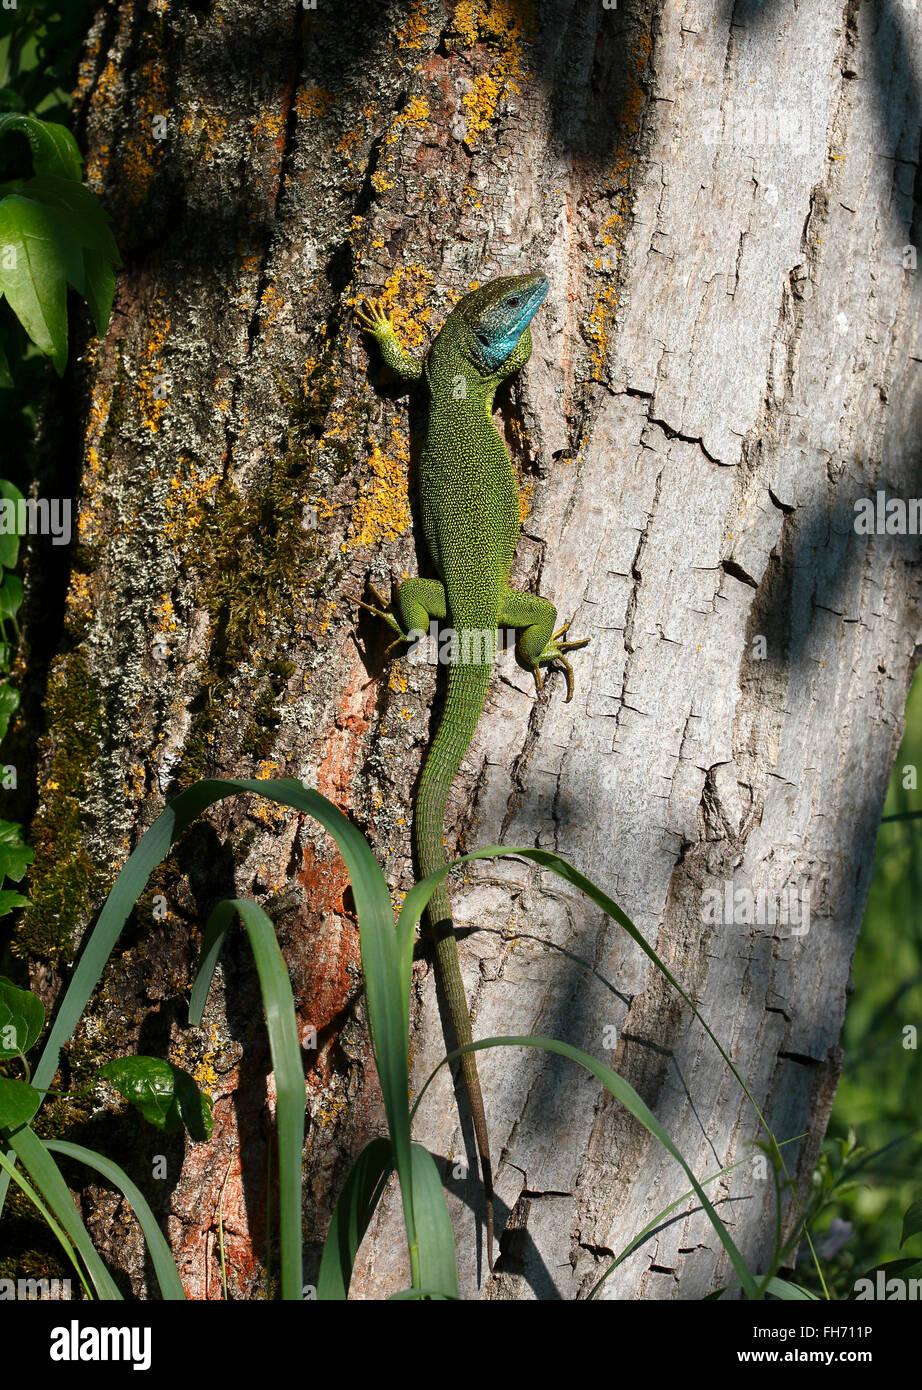 European green lizard (Lacerta viridis) male in mating dress, breeding plumage, basks on a tree trunk Stock Photo